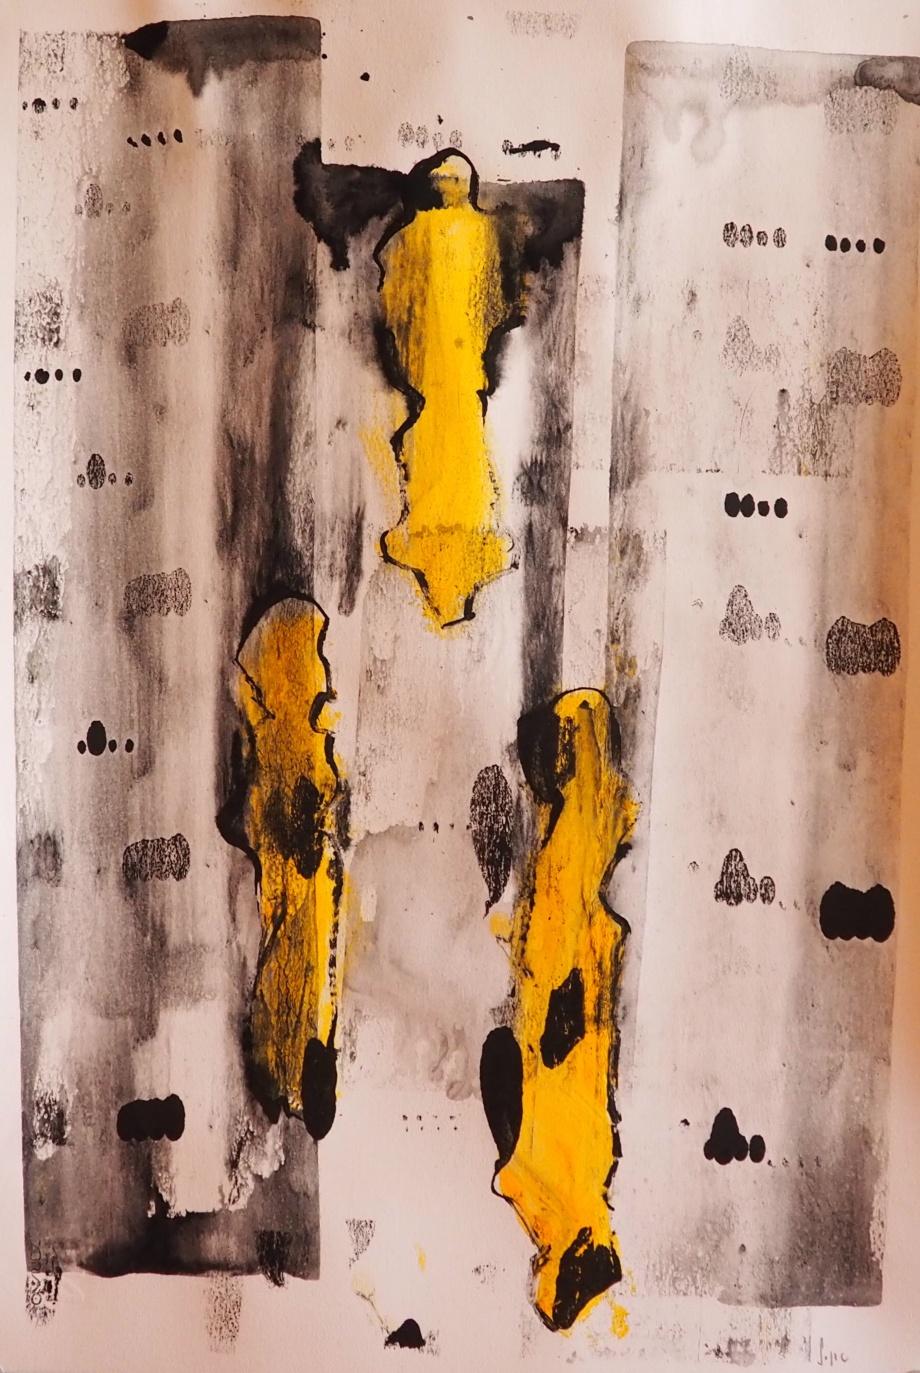 Memes 9, 33 x 48 cm; Gouache on Paper; Sojic, 2018